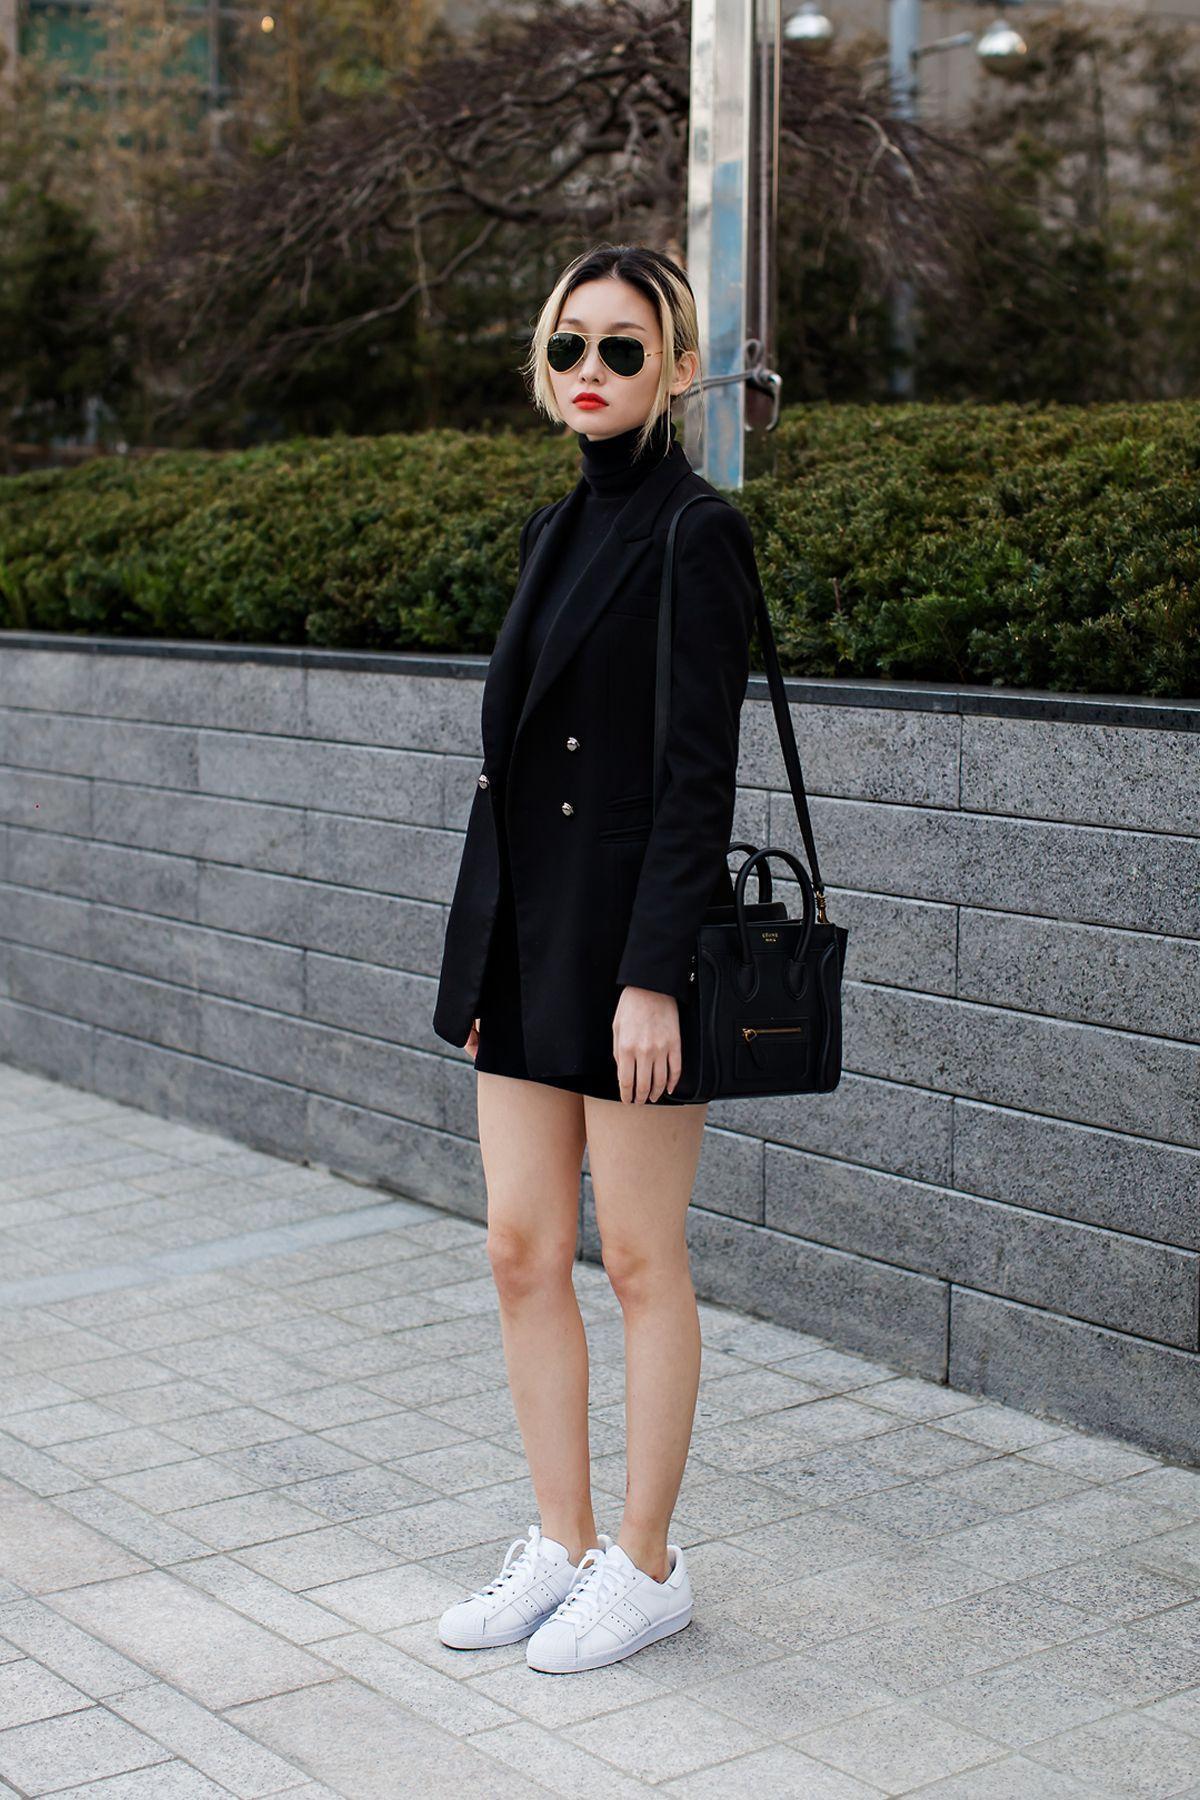 korean fashion trends 8 #koreanfashiontrends#fashion #korean